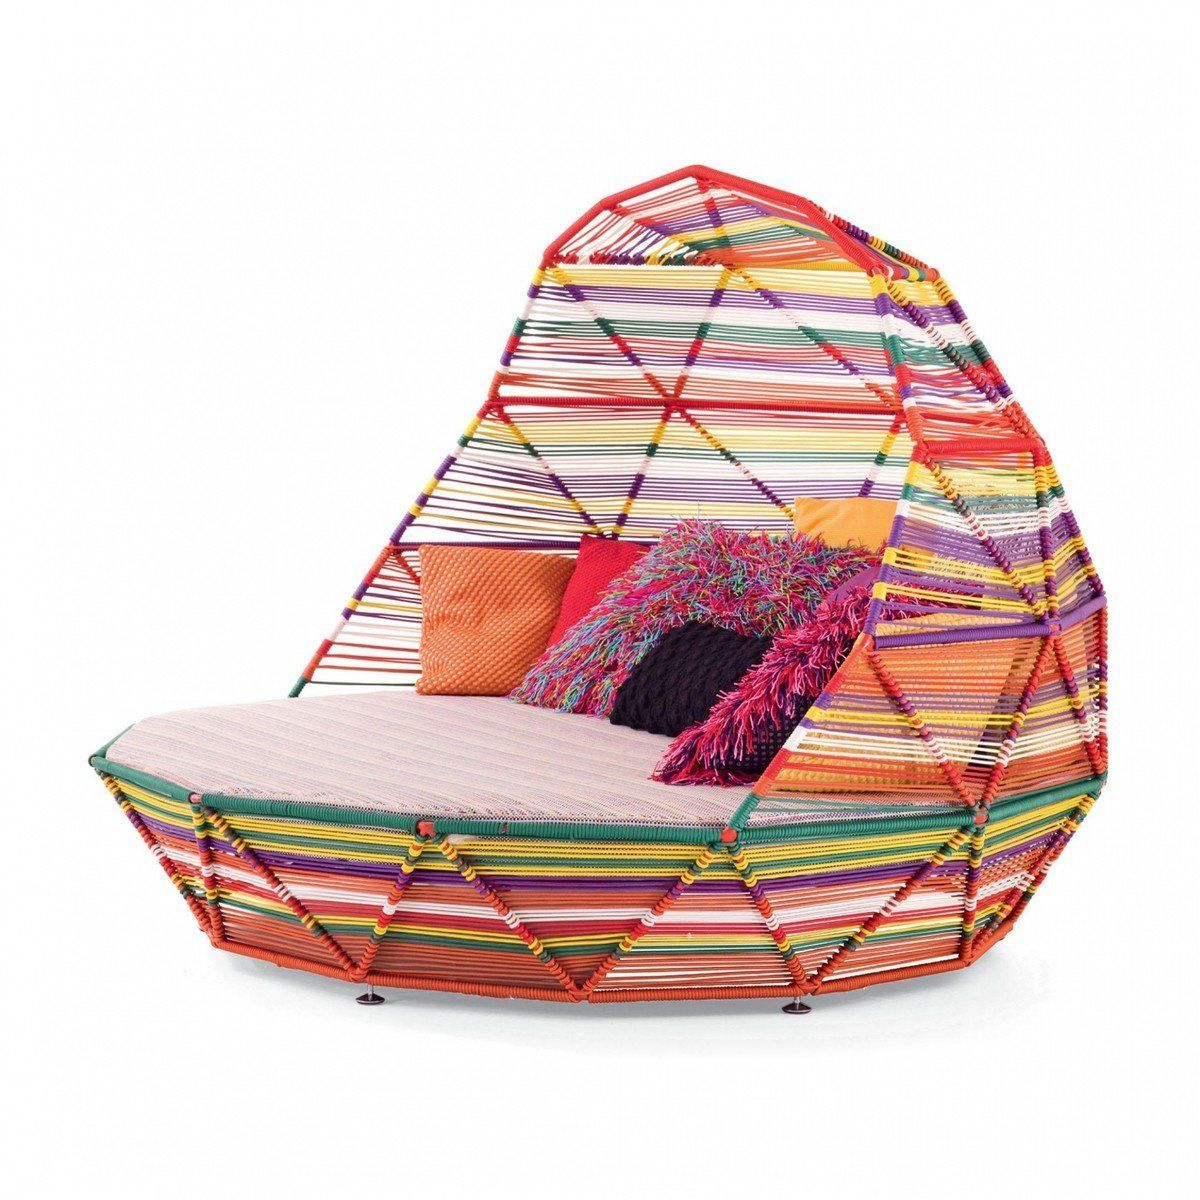 tropicalia tagesbett moroso. Black Bedroom Furniture Sets. Home Design Ideas